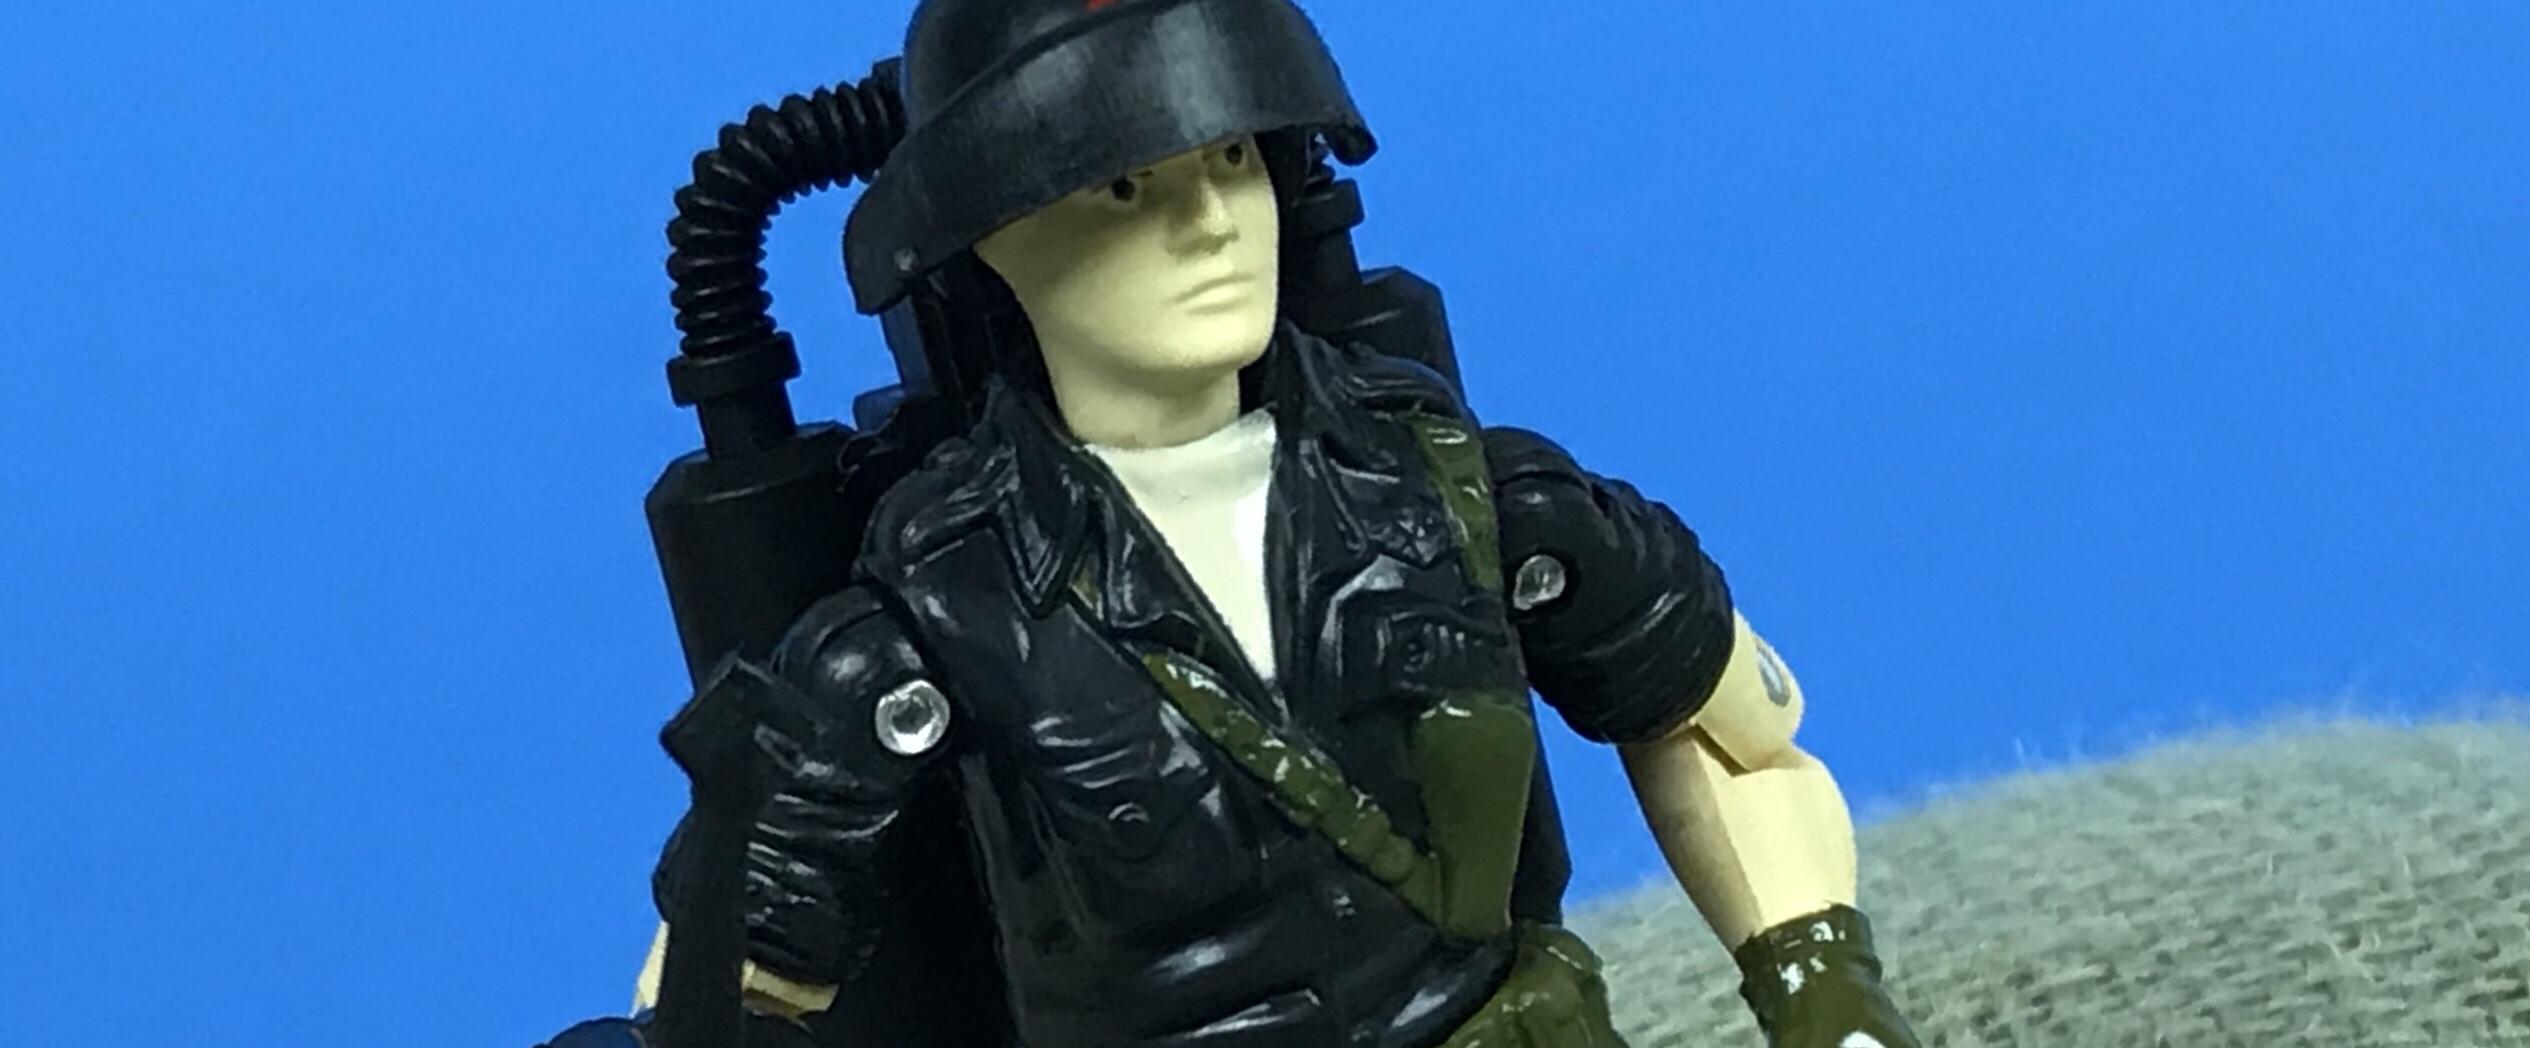 Gi Joe Black Major custom Night Force Starduster